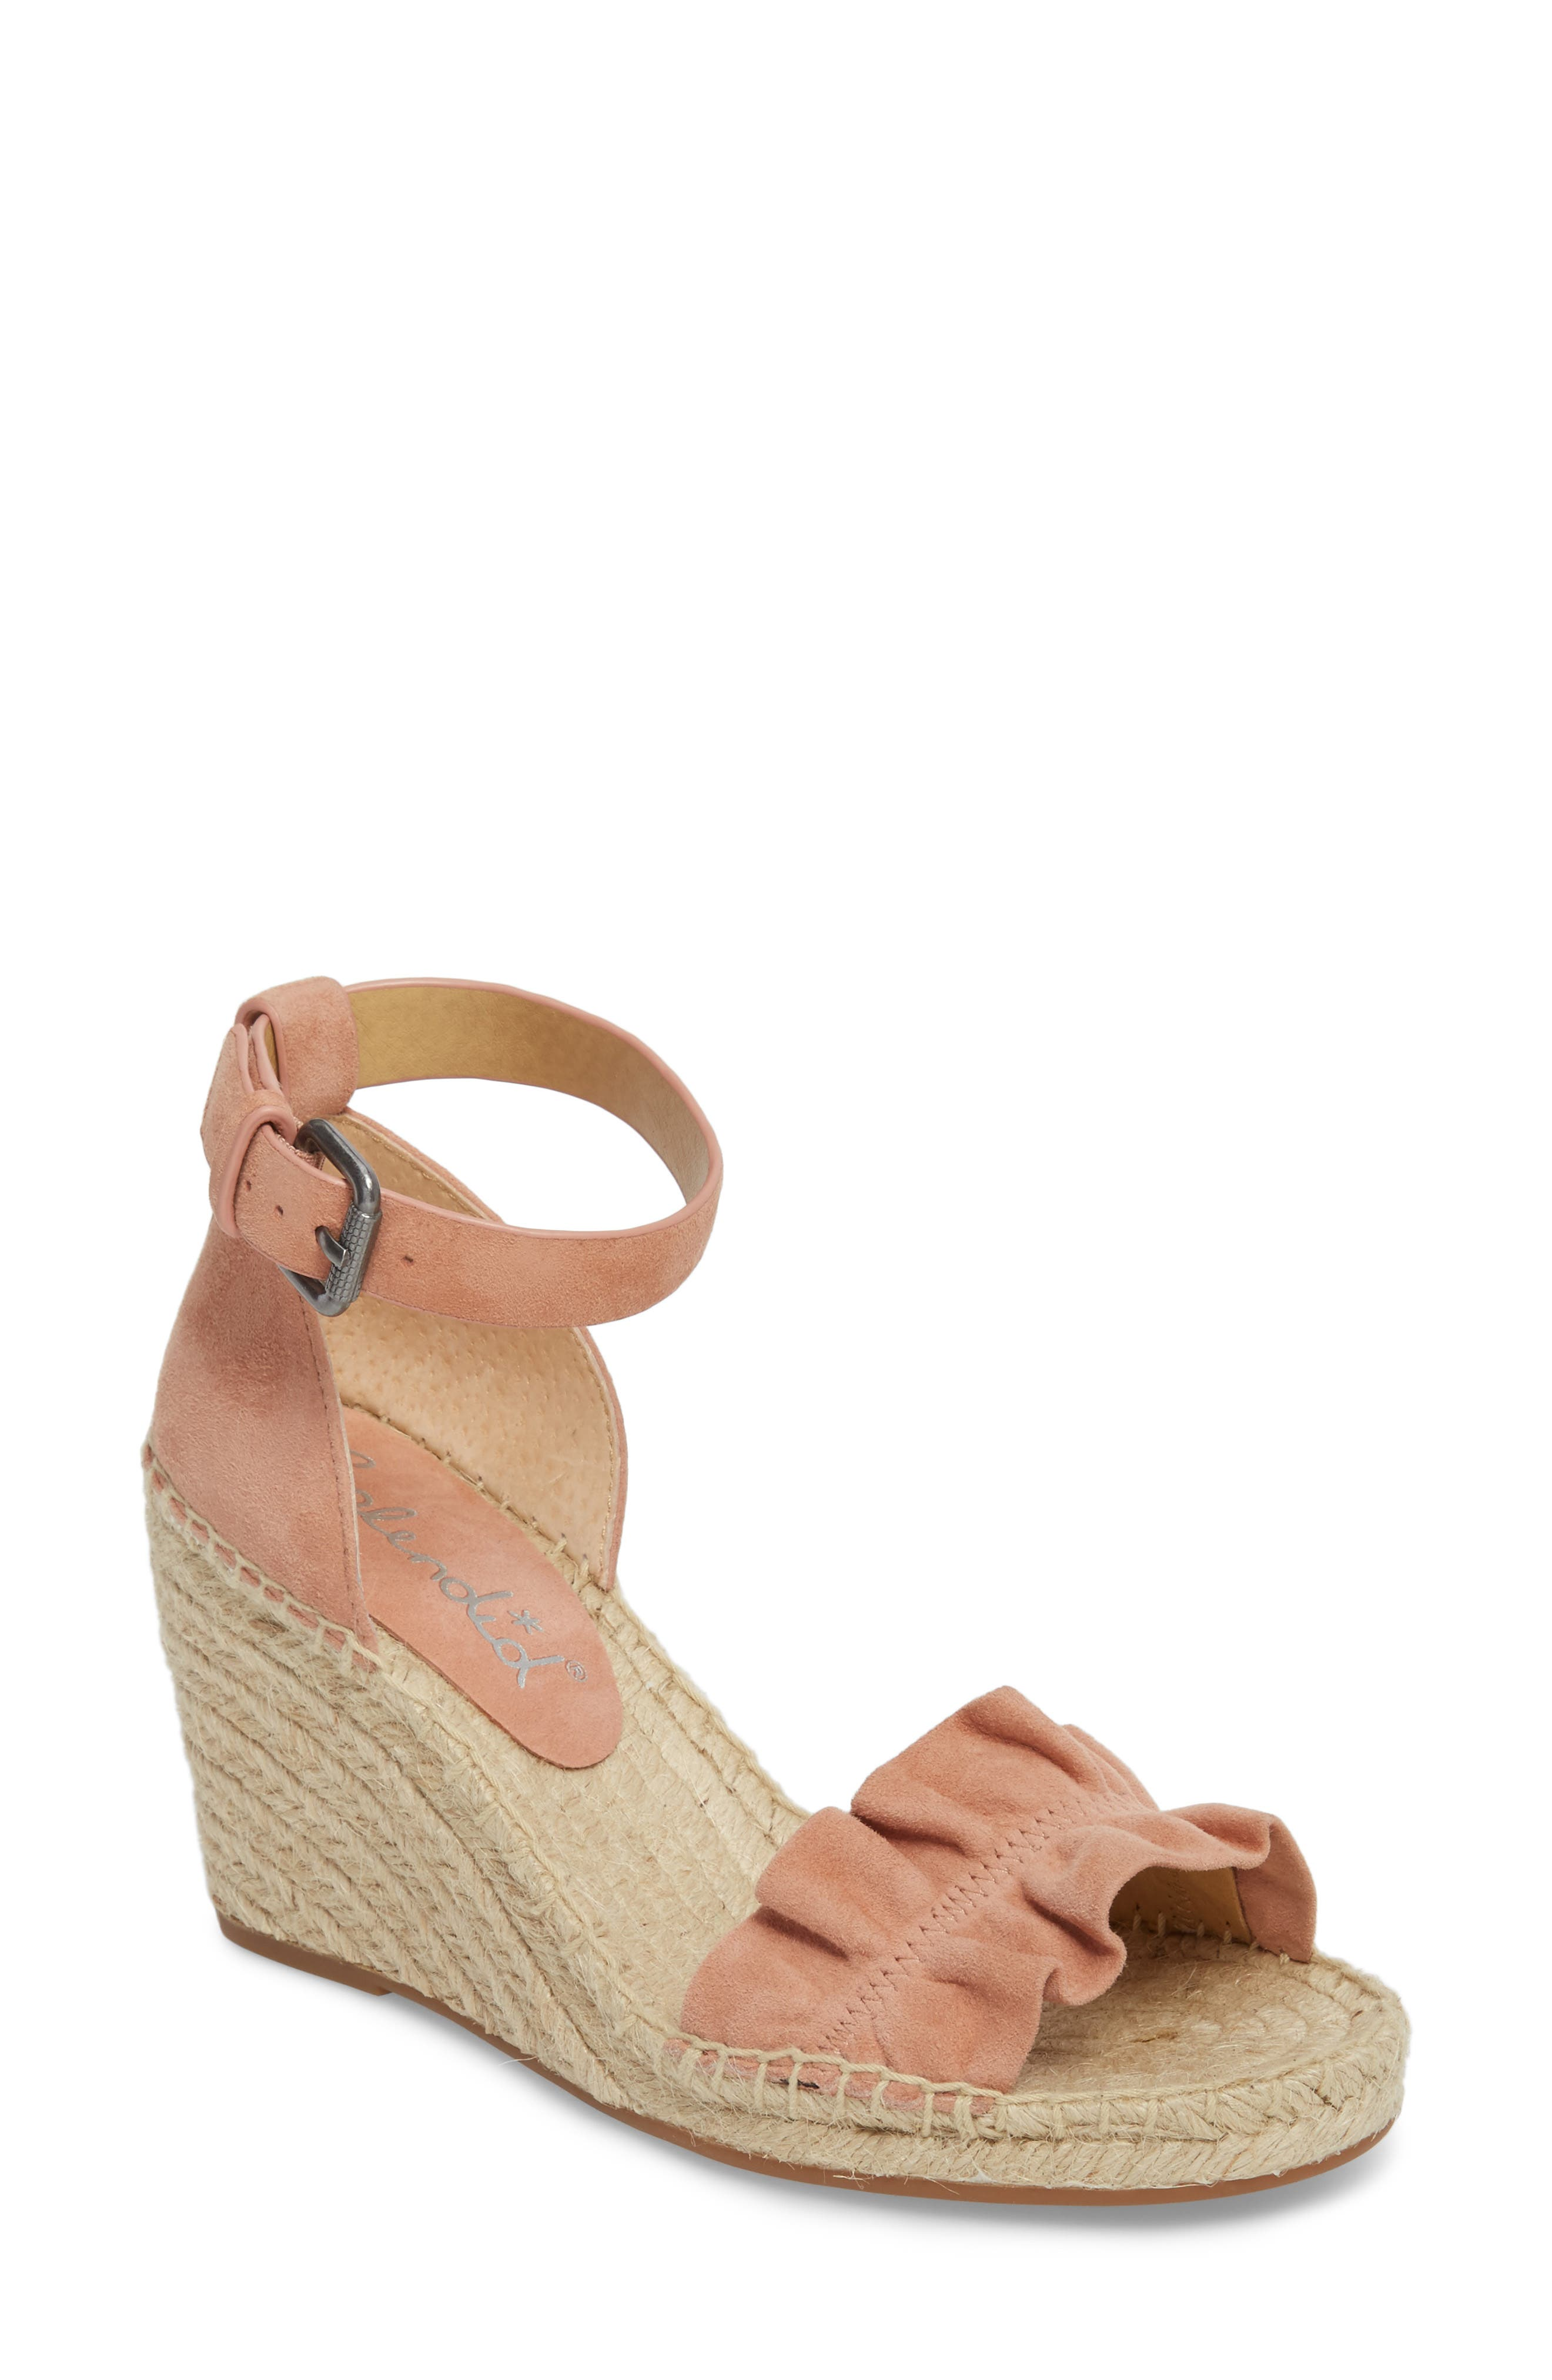 Bedford Espadrille Wedge Sandal,                         Main,                         color, Dark Blush Suede